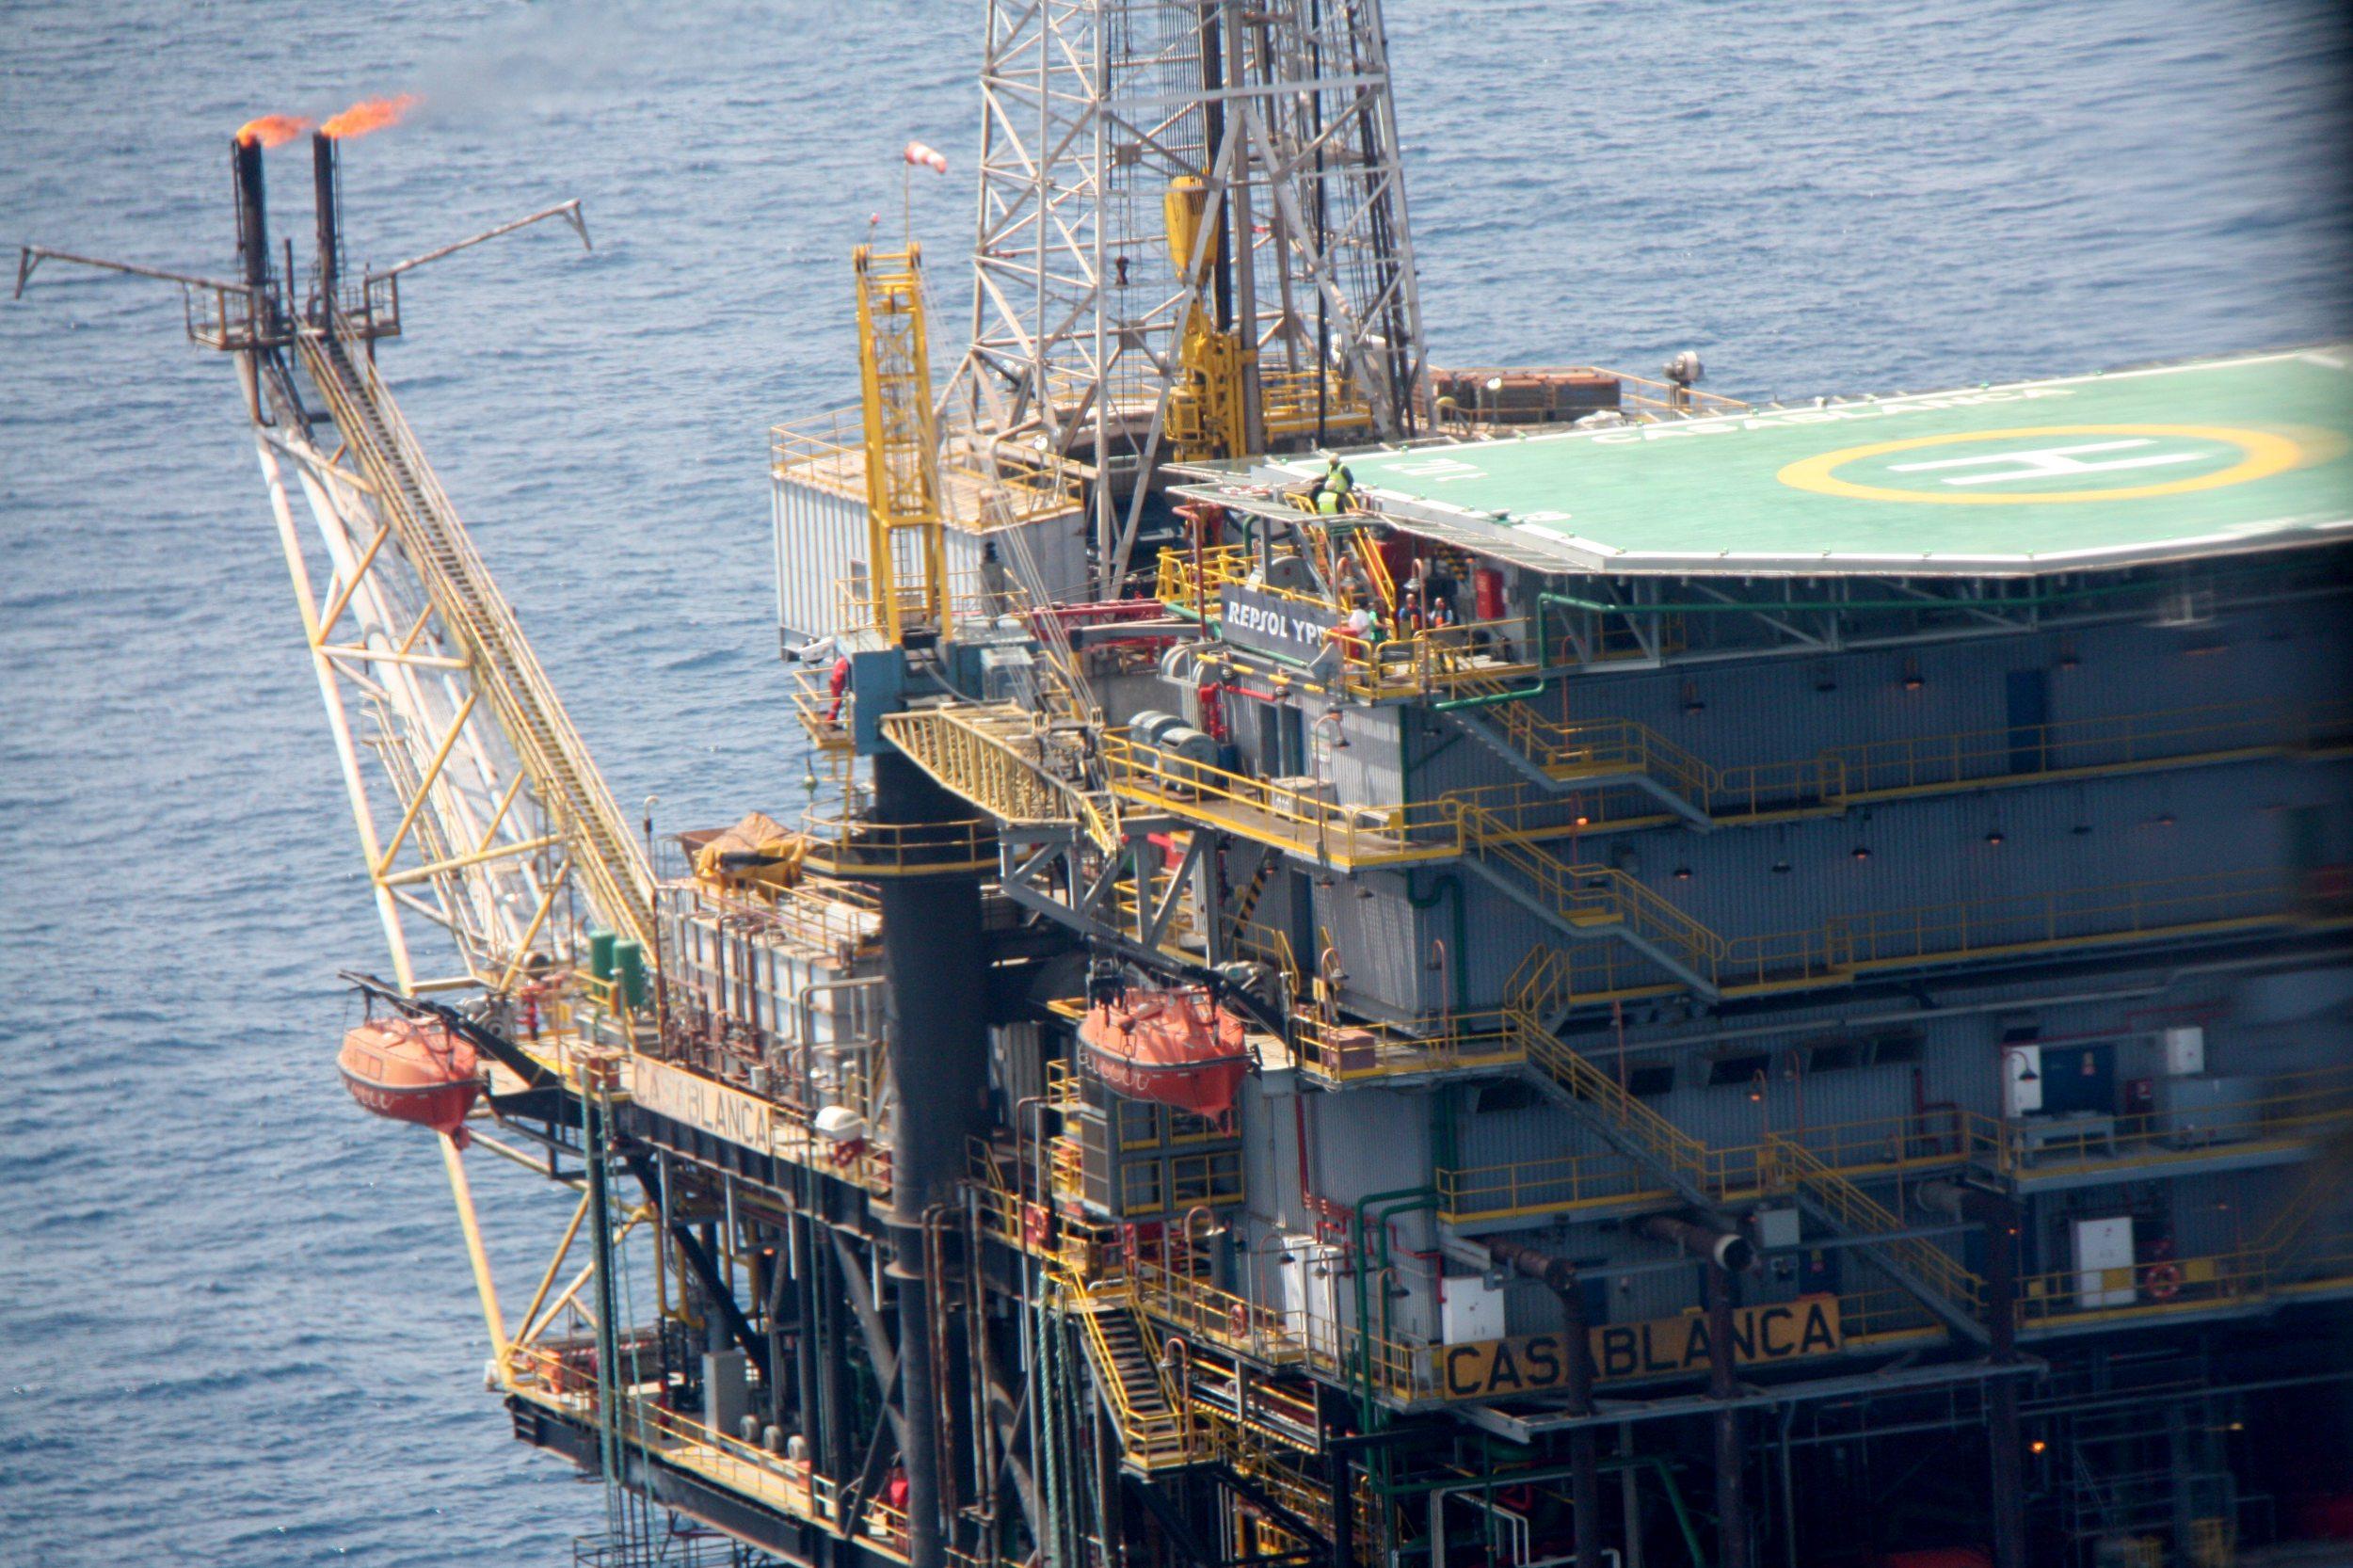 Les instal·lacions de la plataforma petrolífera Casablanca   ACN